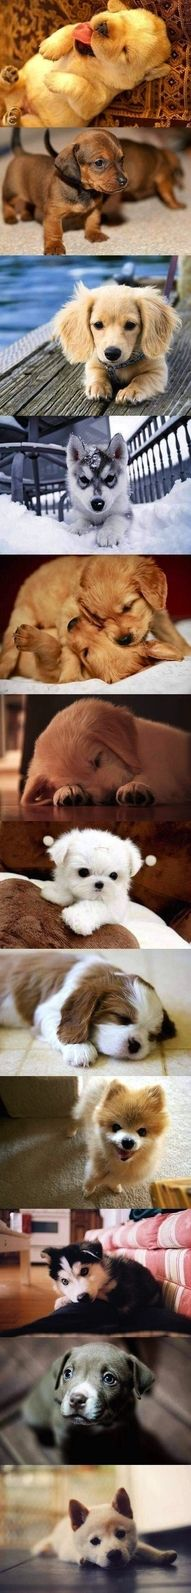 puppy love! LOVE them all!!!!